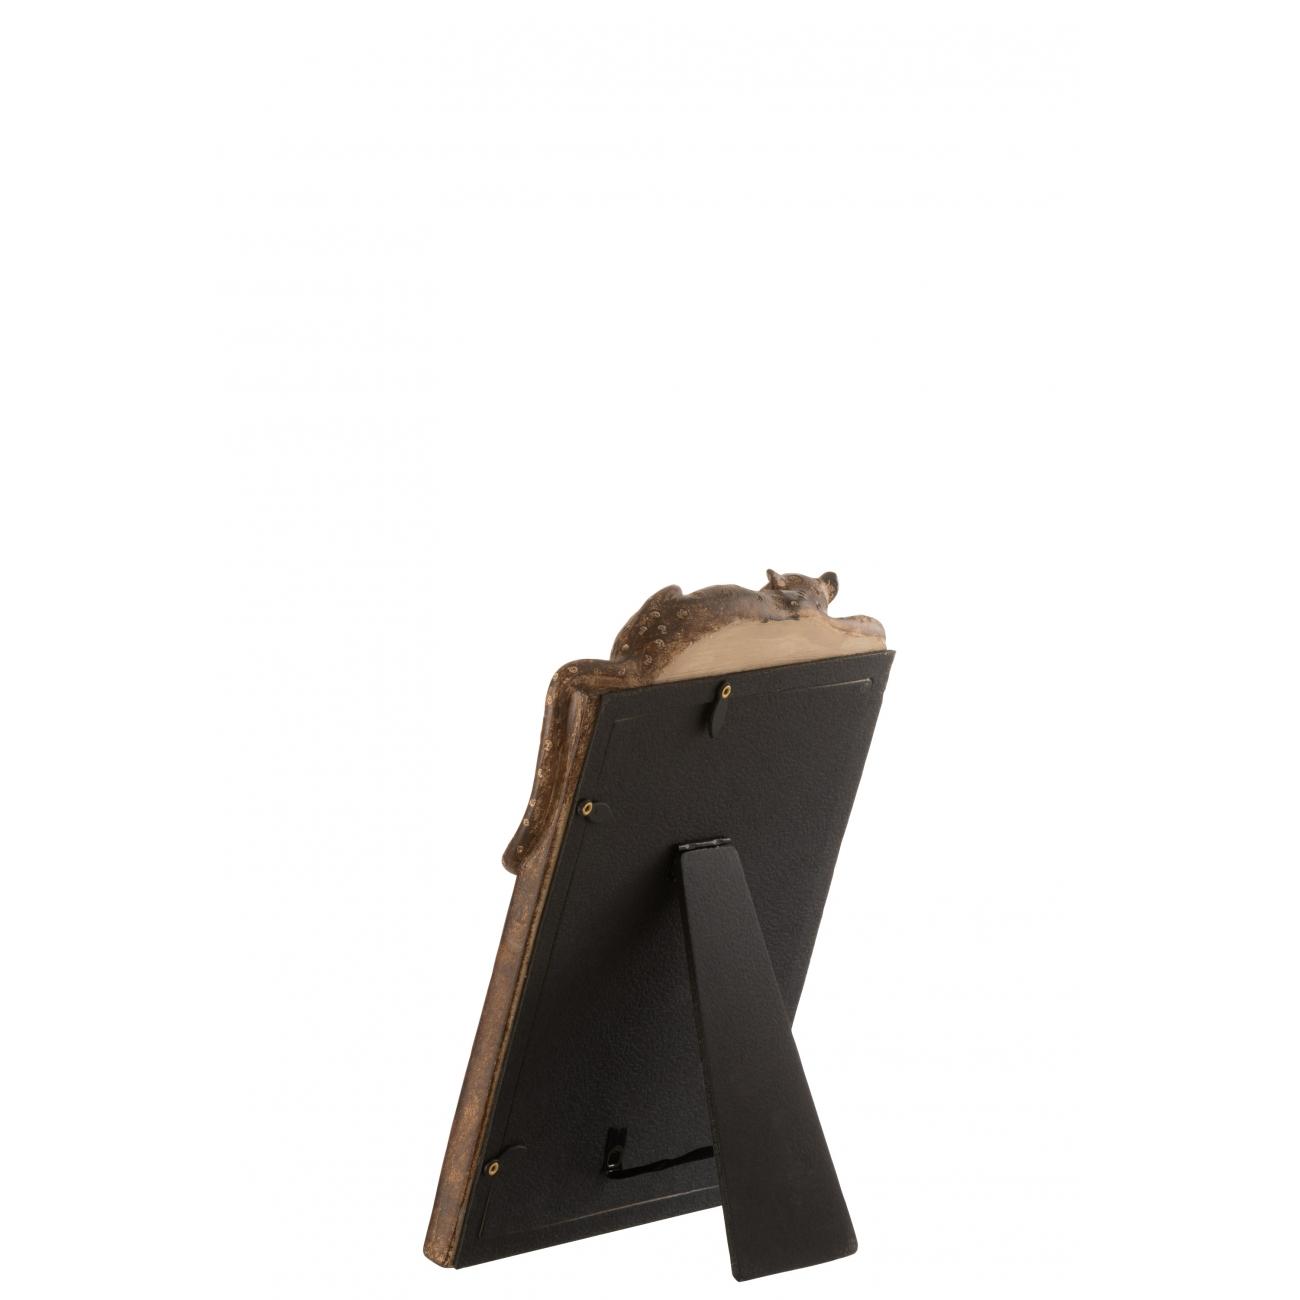 Фоторамка J-LINE коричневая с декором леопард 13x18 см Бельгия